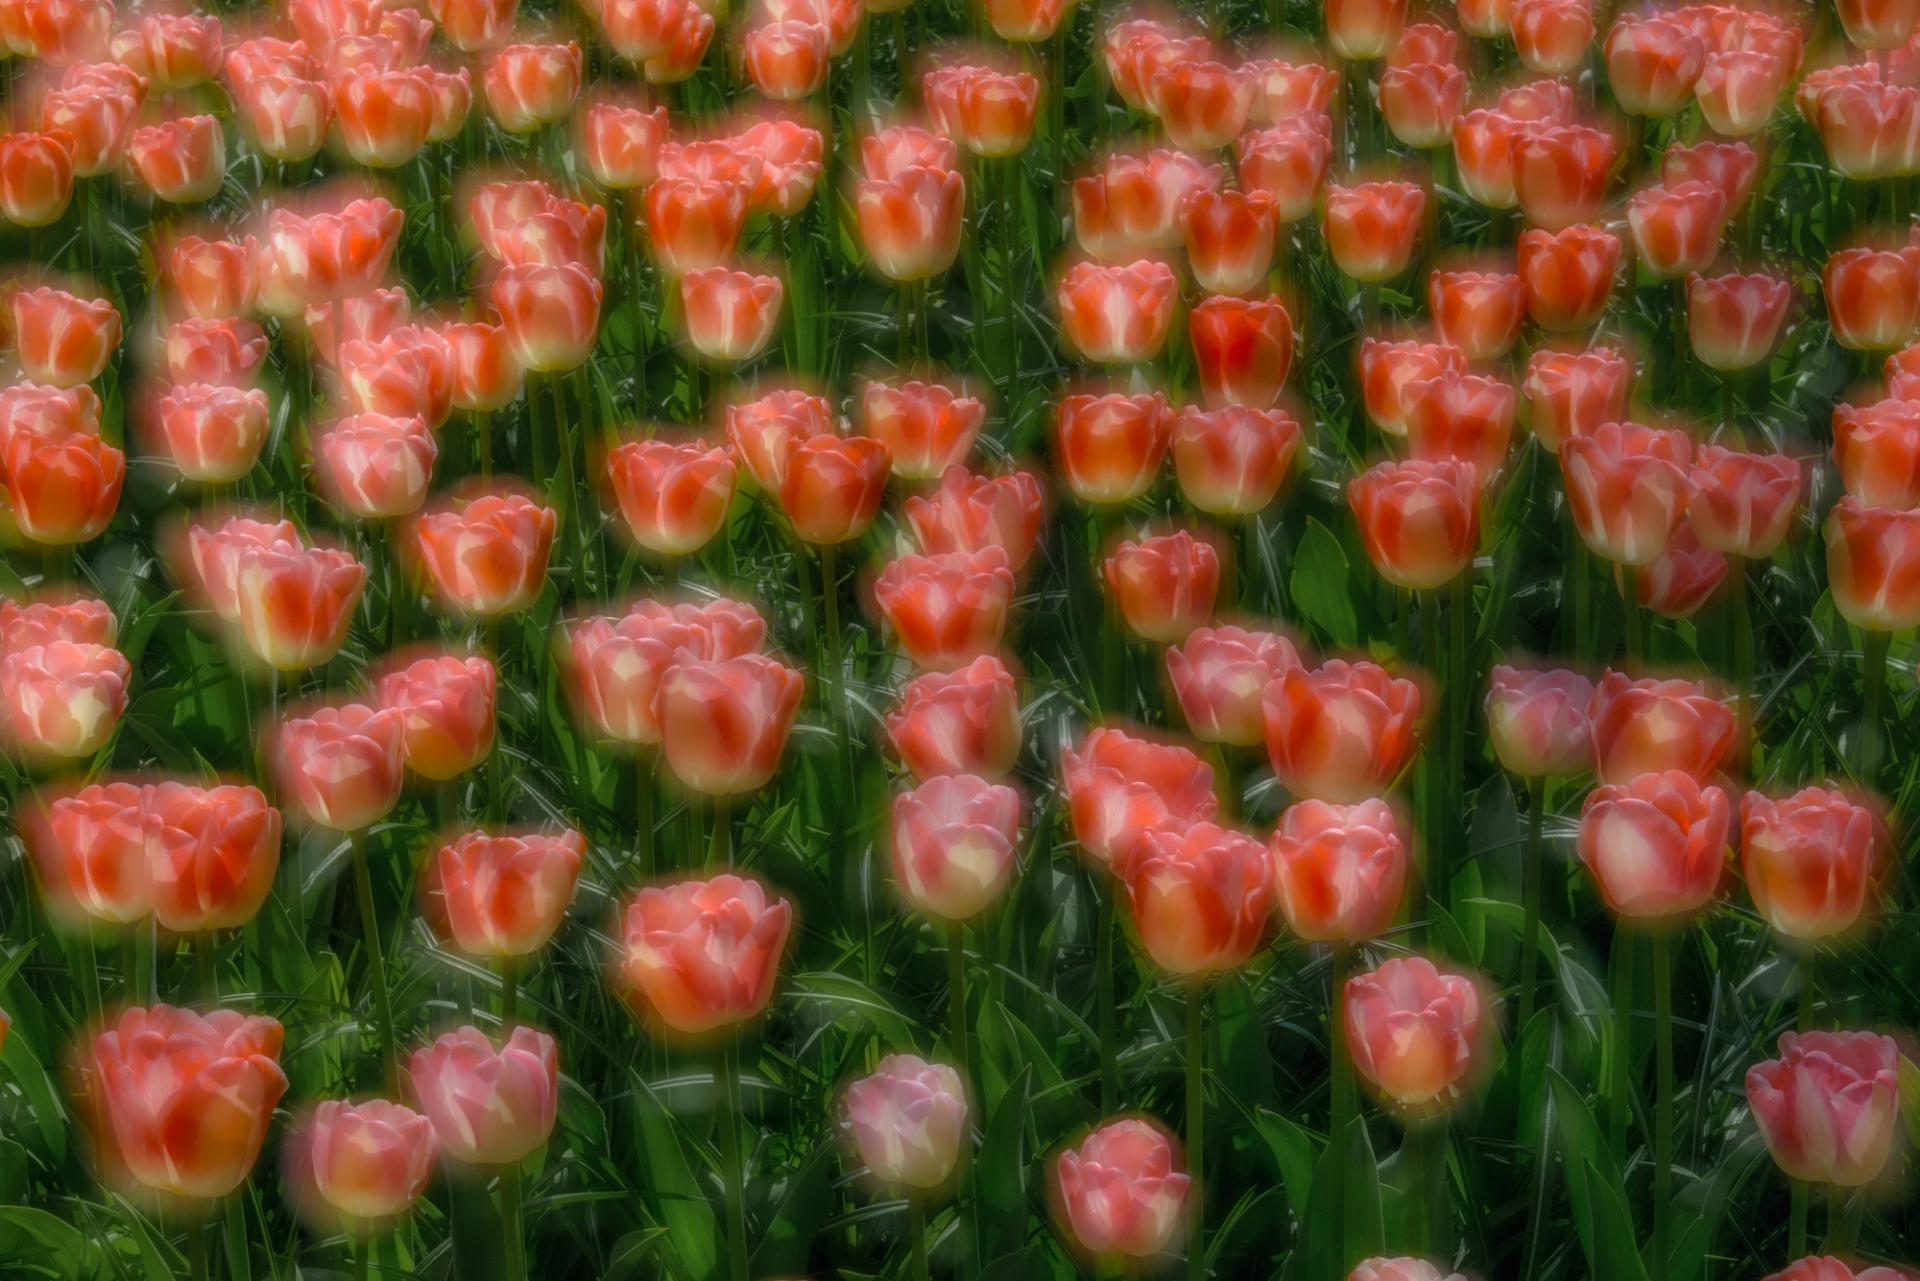 Storie dal pianeta terra - Tulip Fields